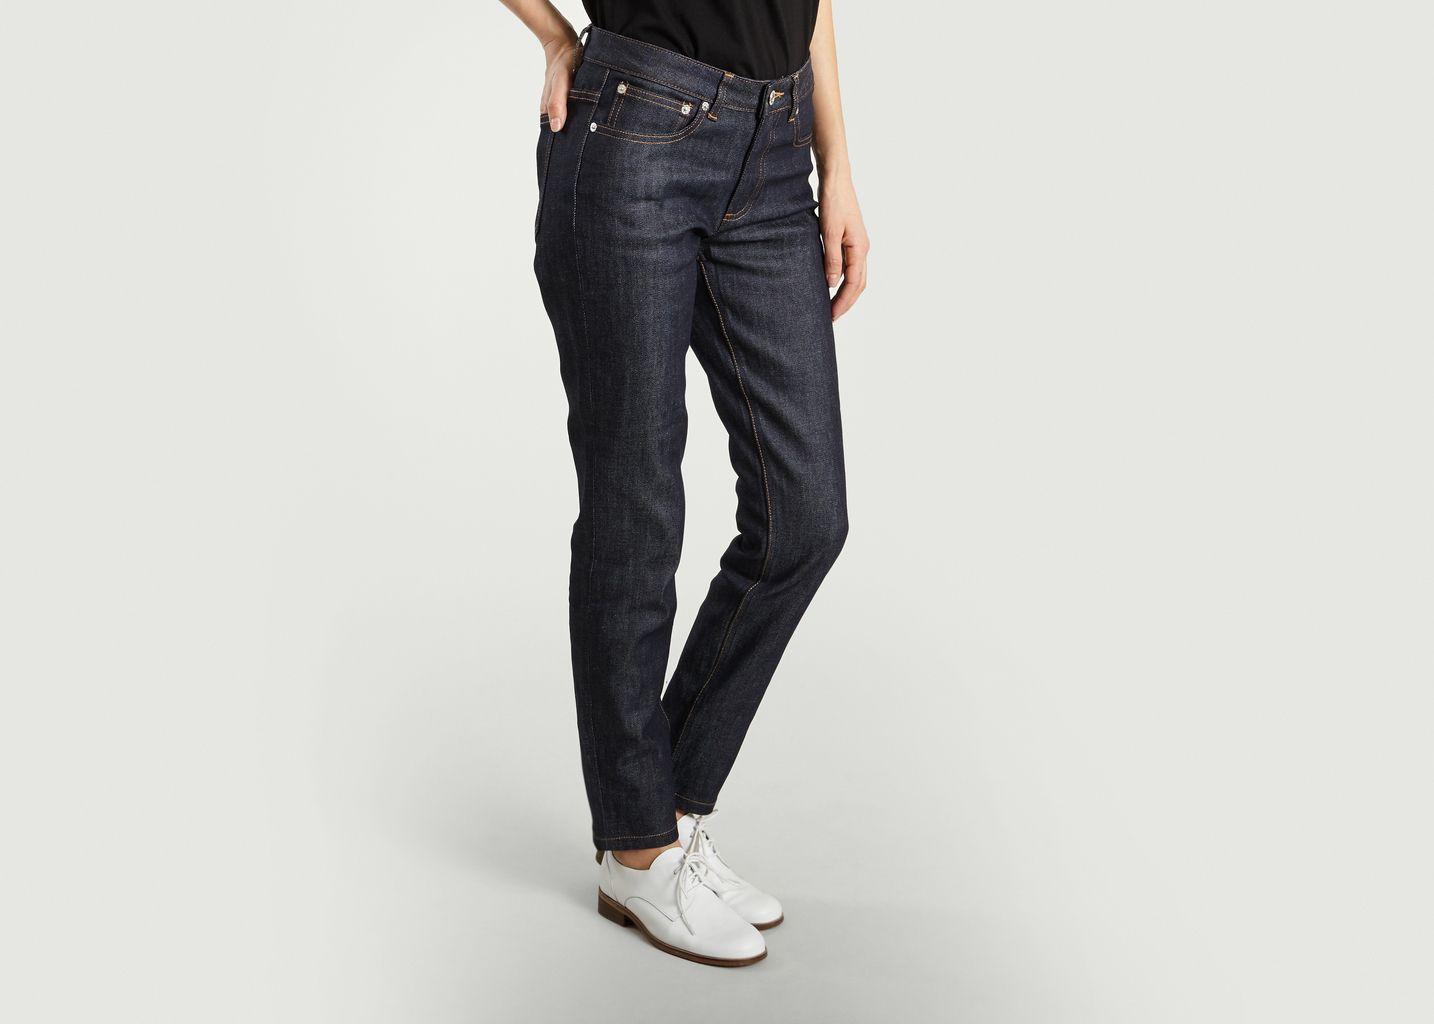 Jean High Standard - A.P.C.